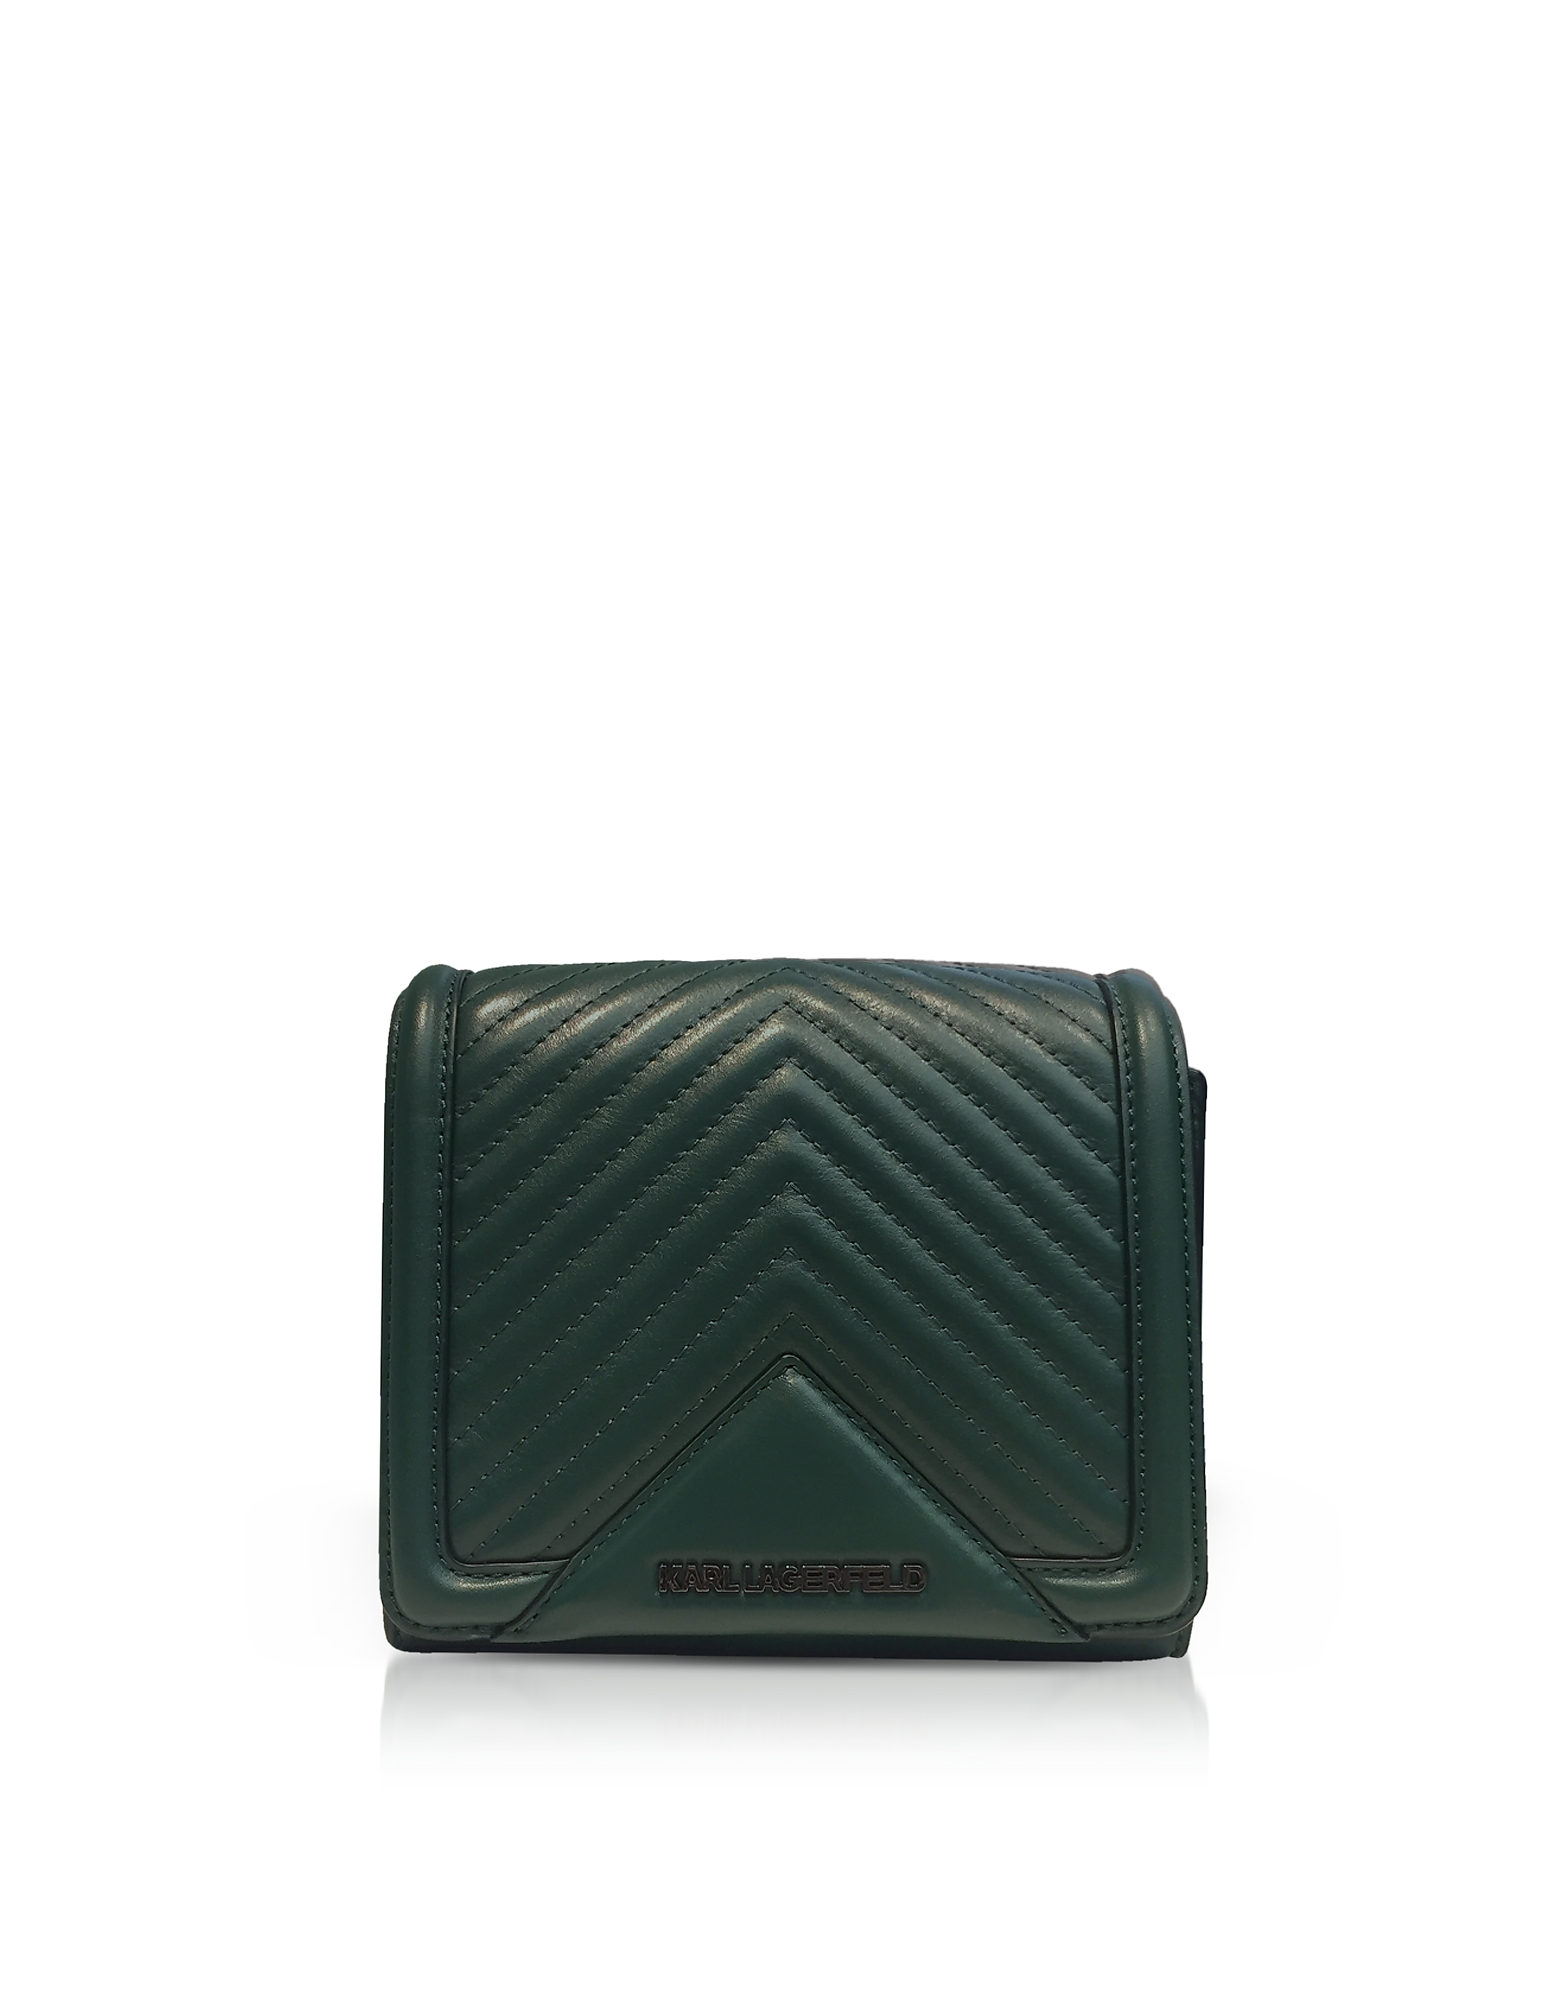 Karl Lagerfeld Handbags, K/Klassik Small Quilted Shoulder Bag